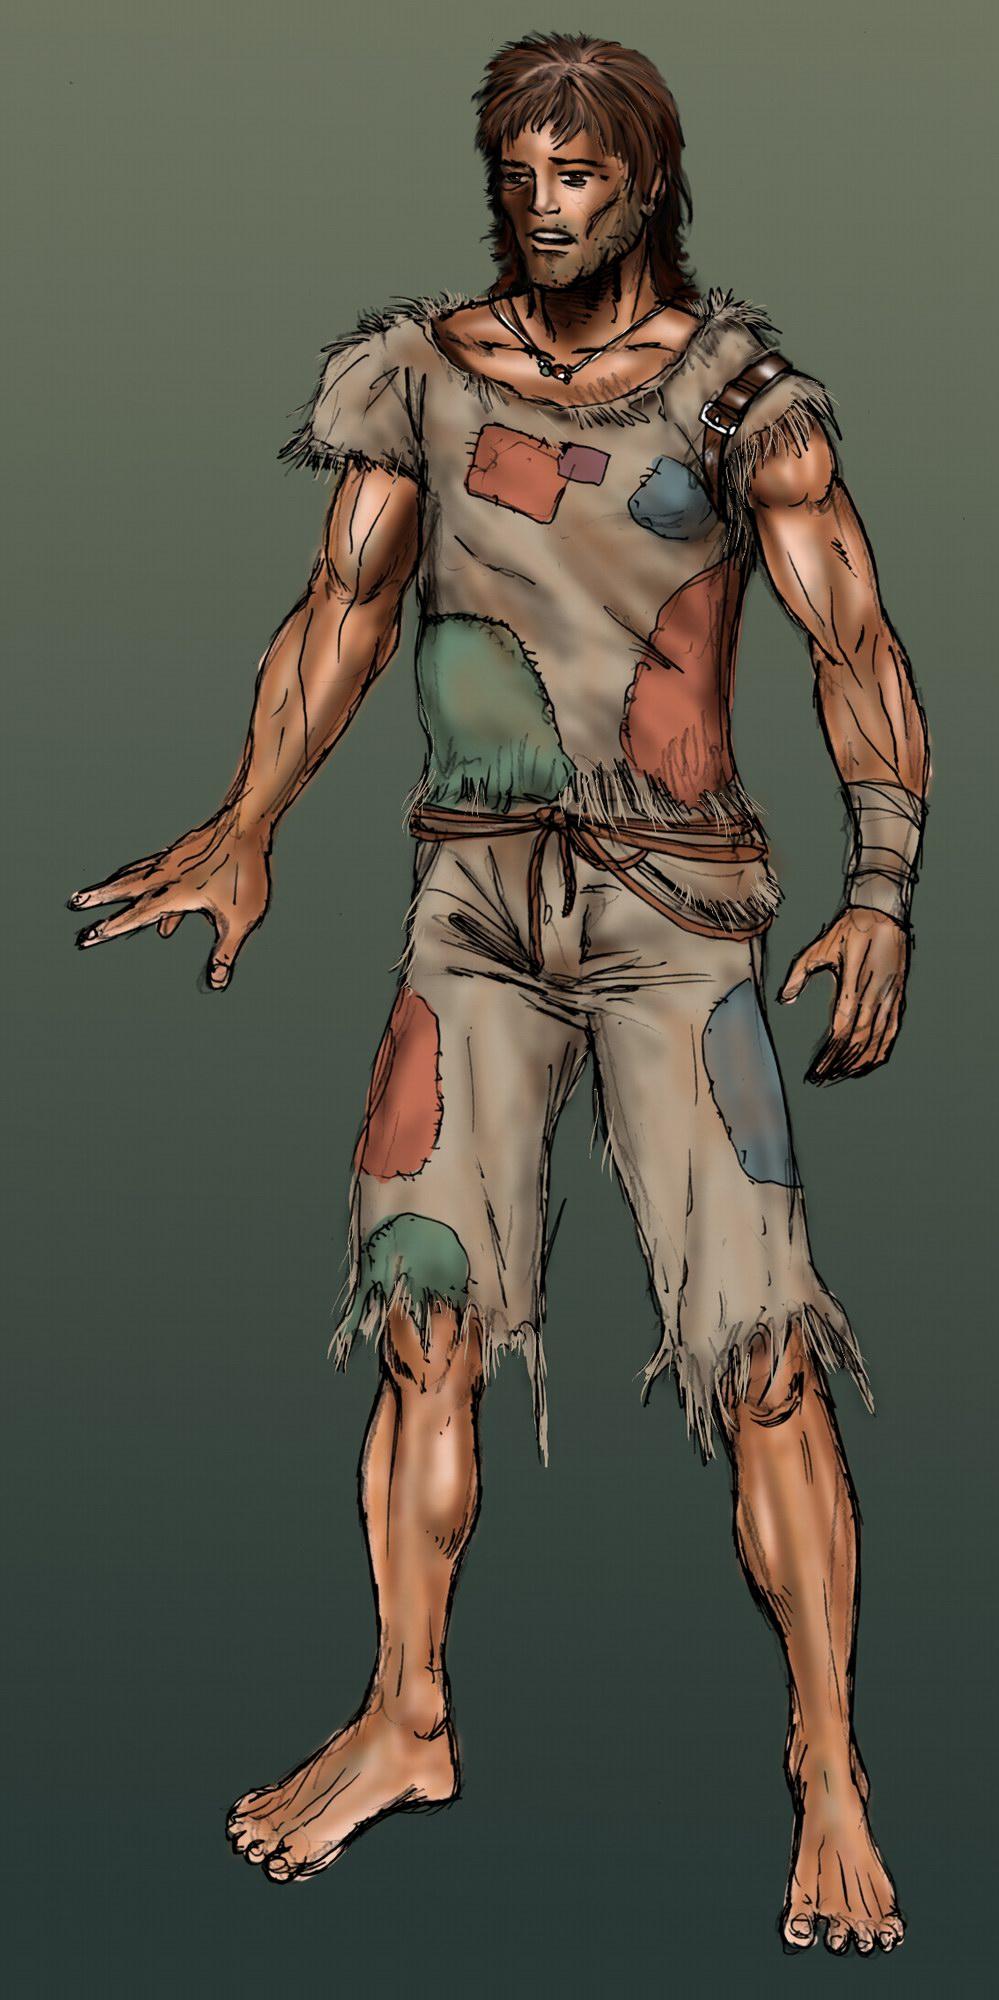 FoT civilian male